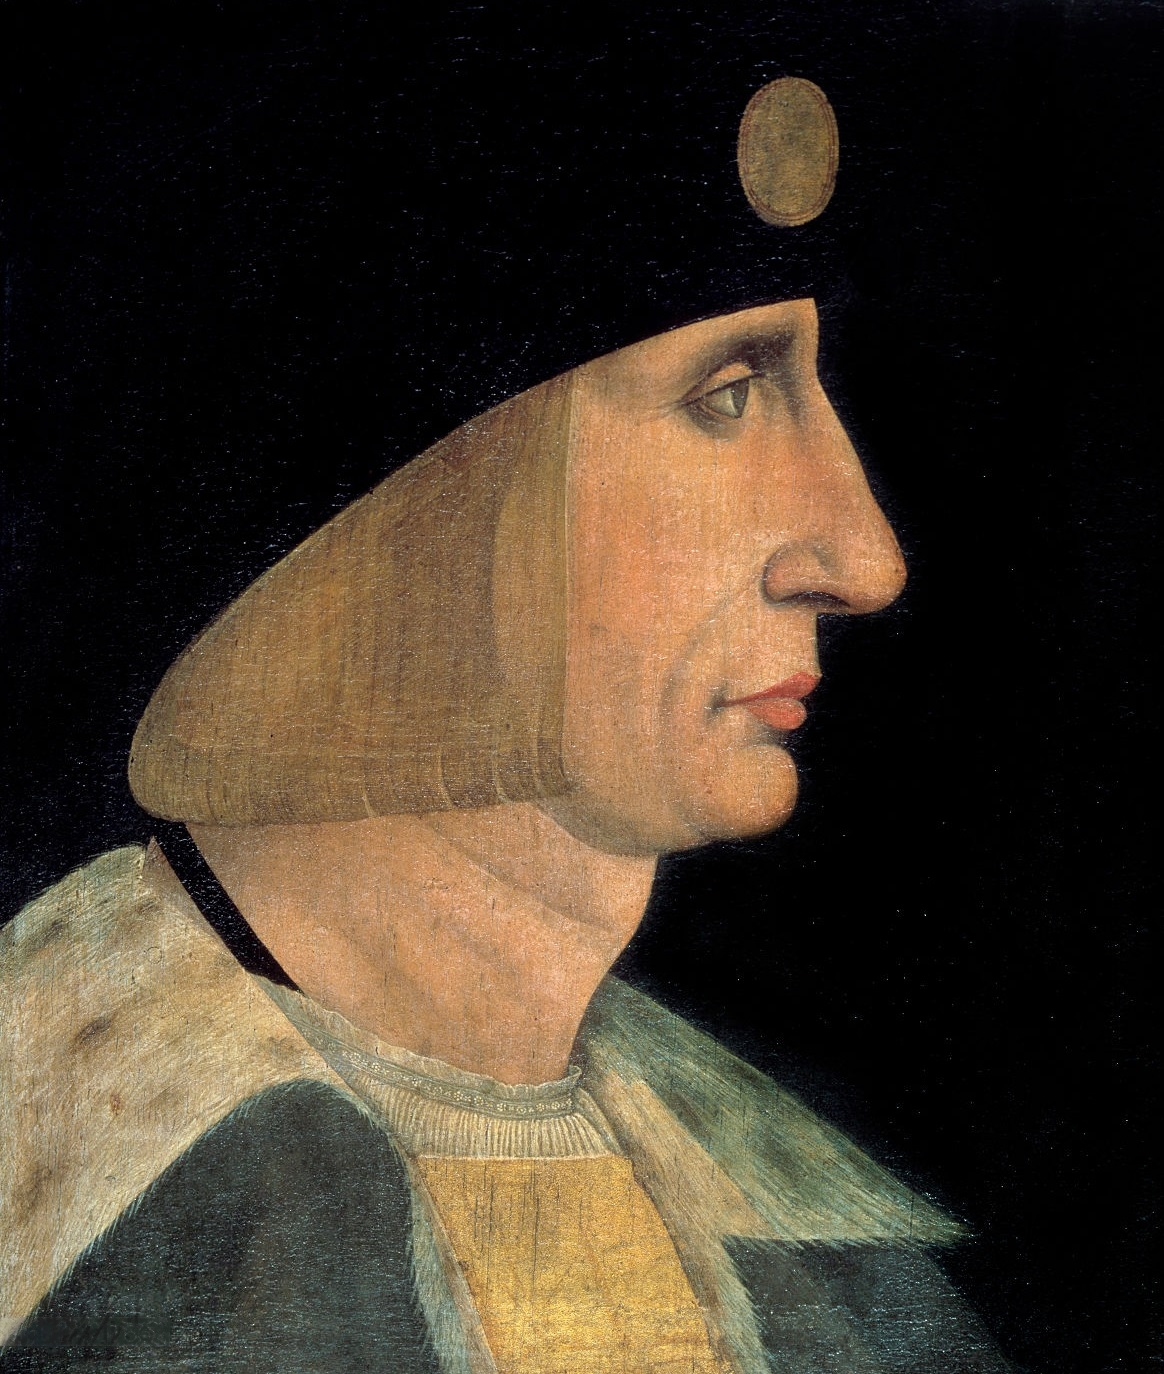 Galerie des souverains eslagnols Ludvig_XII_av_Frankrike_p%C3%A5_m%C3%A5lning_fr%C3%A5n_1500-talet